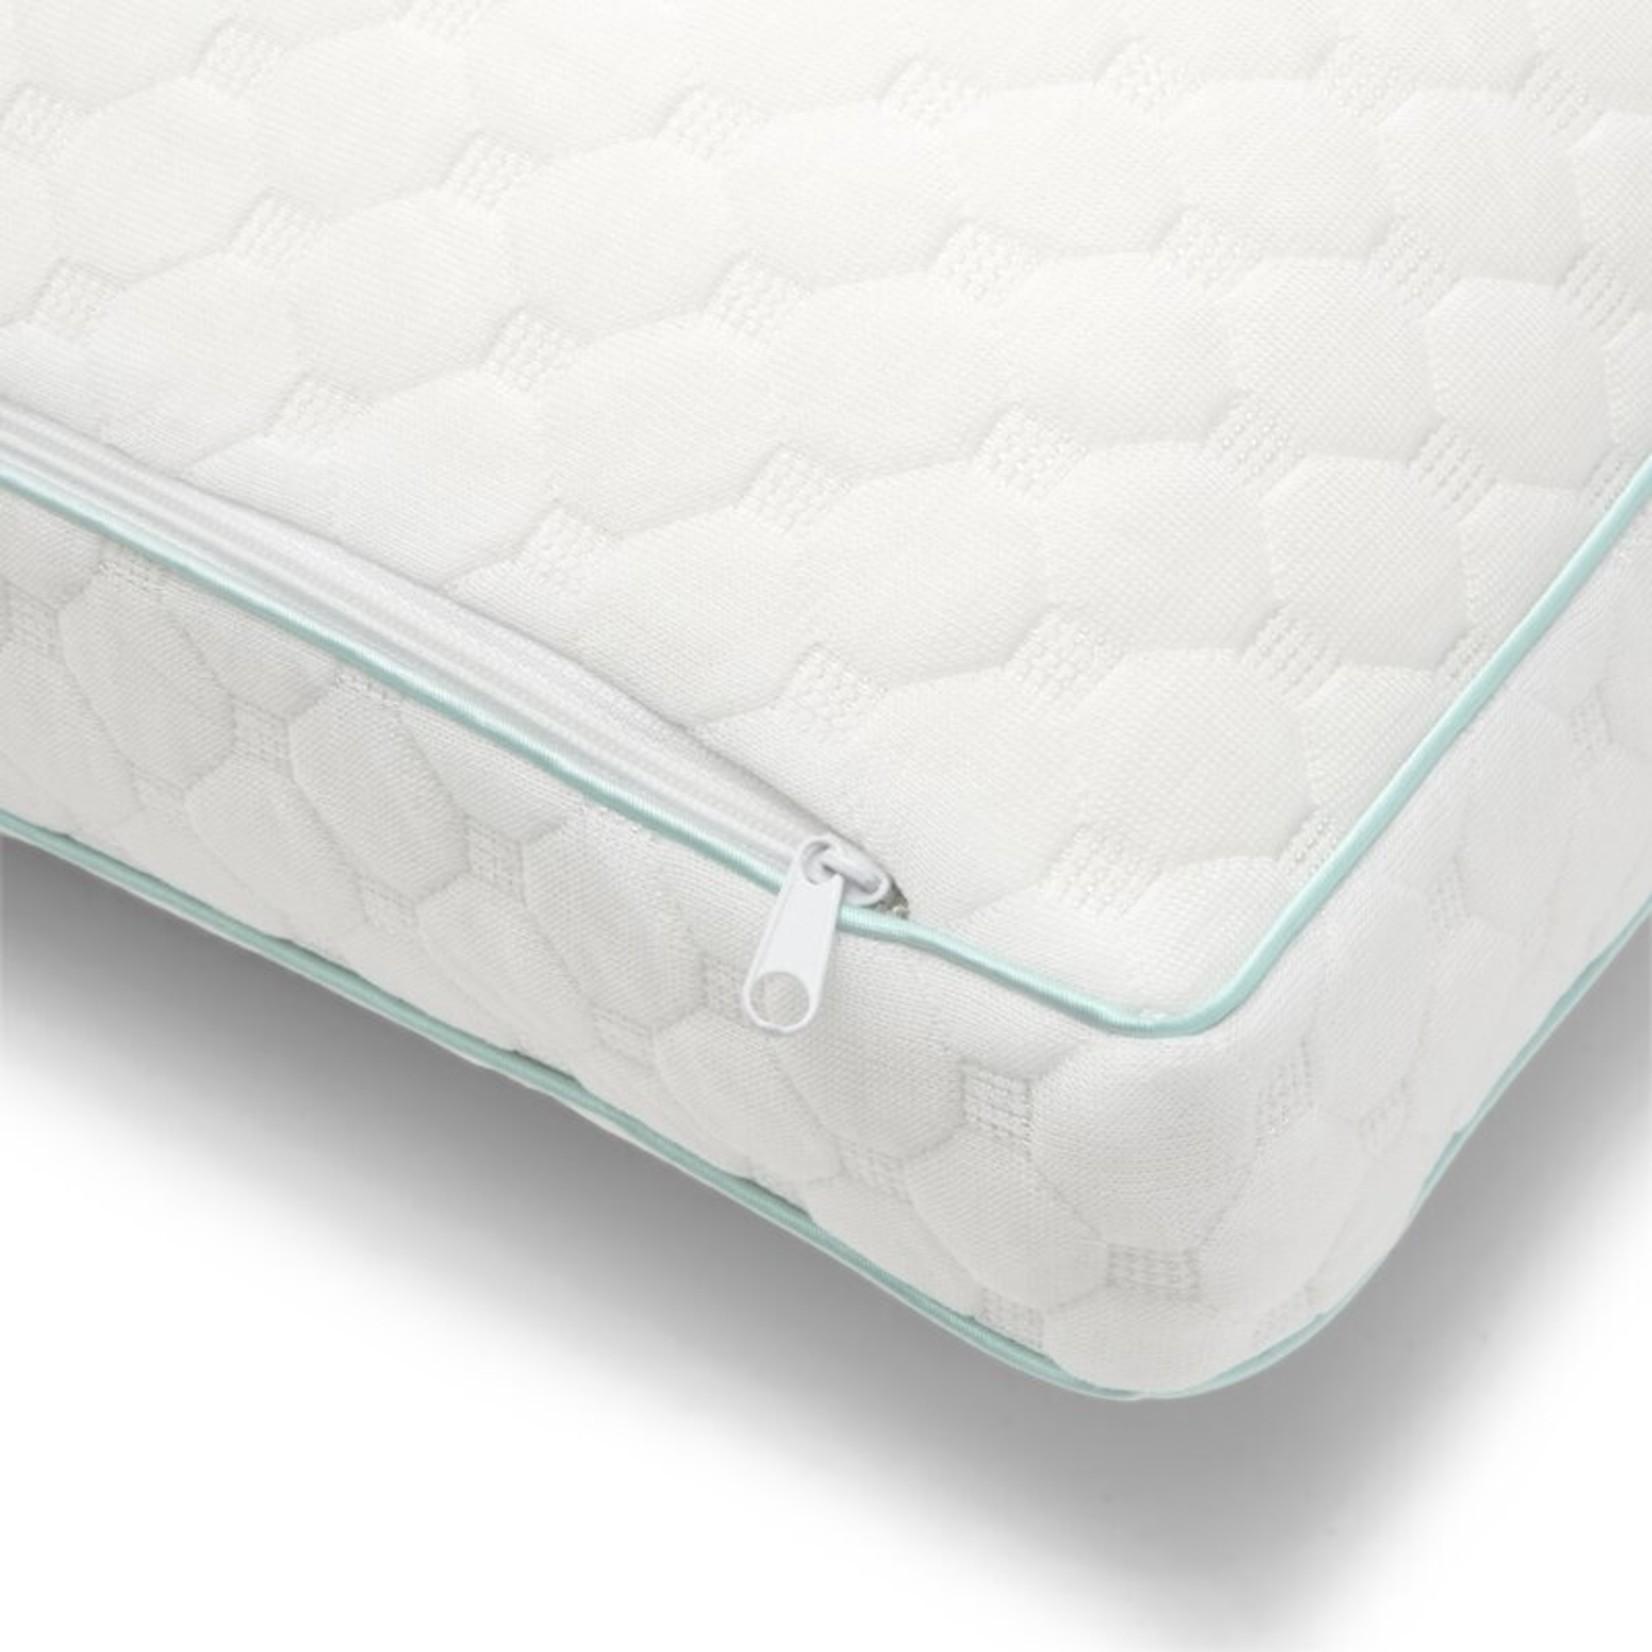 *Sealy Medium Memory Foam Bed Pillow - Final Sale